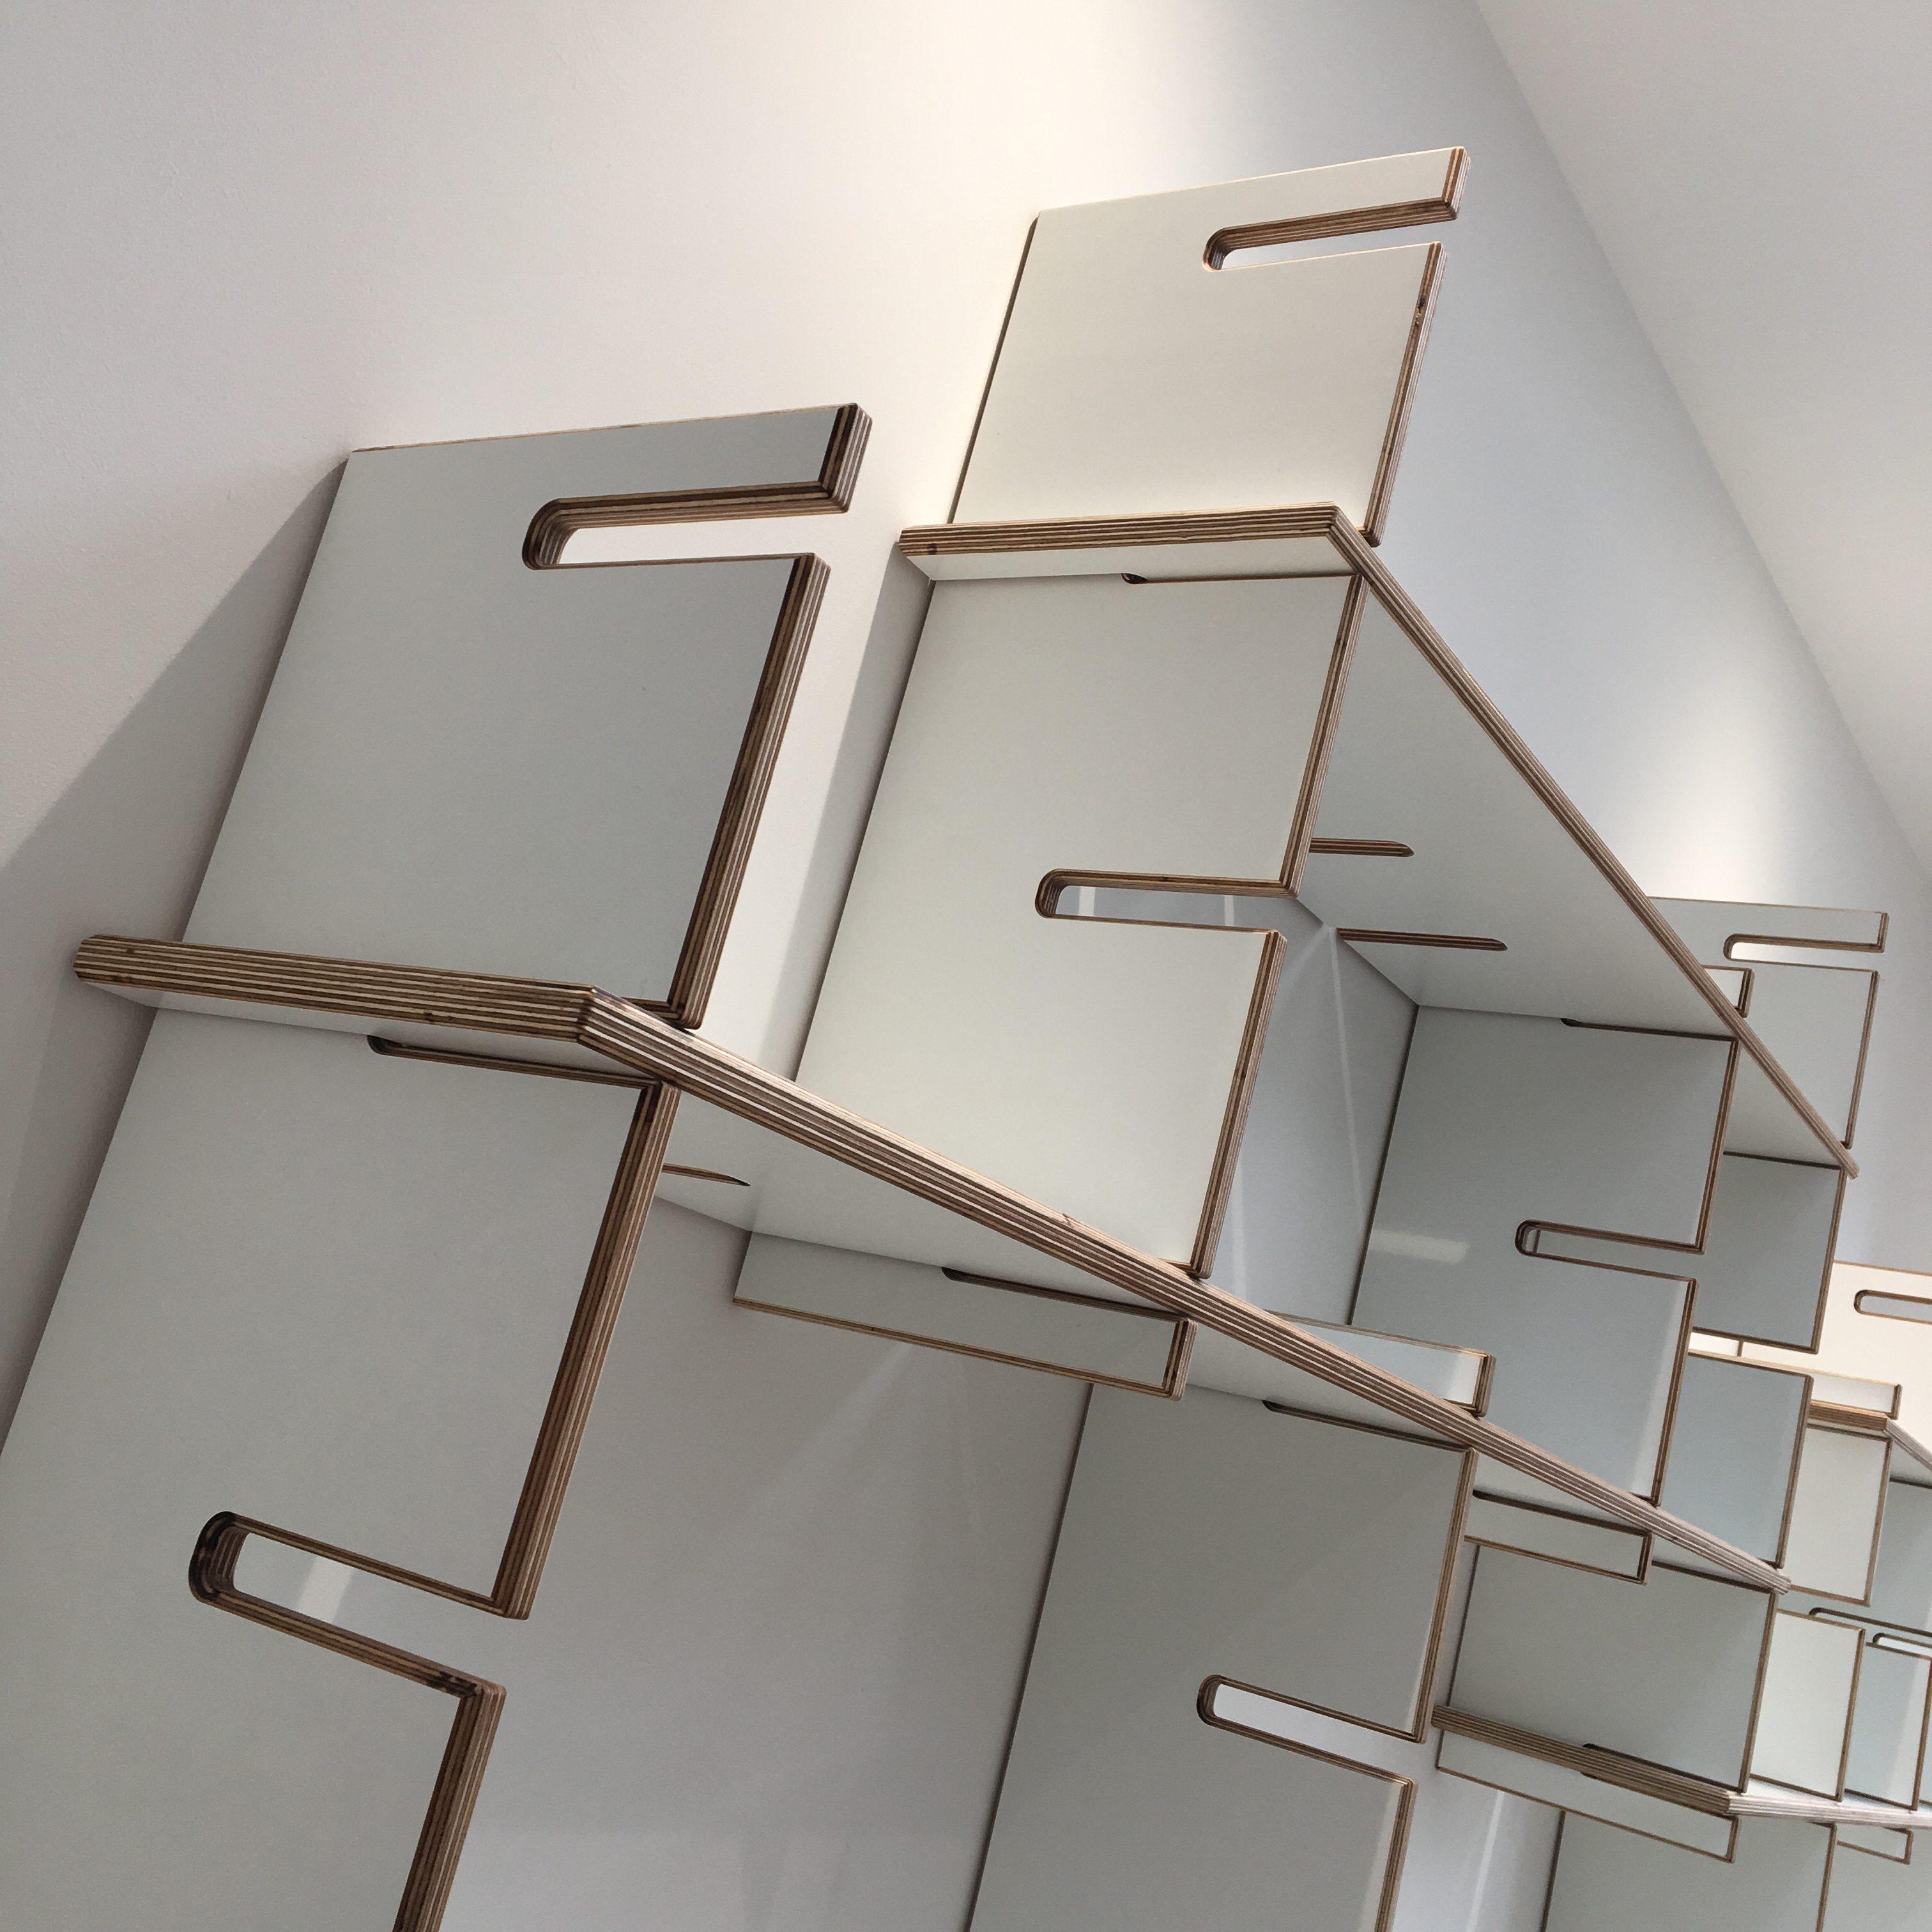 PLYable Plywood Adjustable Shelving Furniture